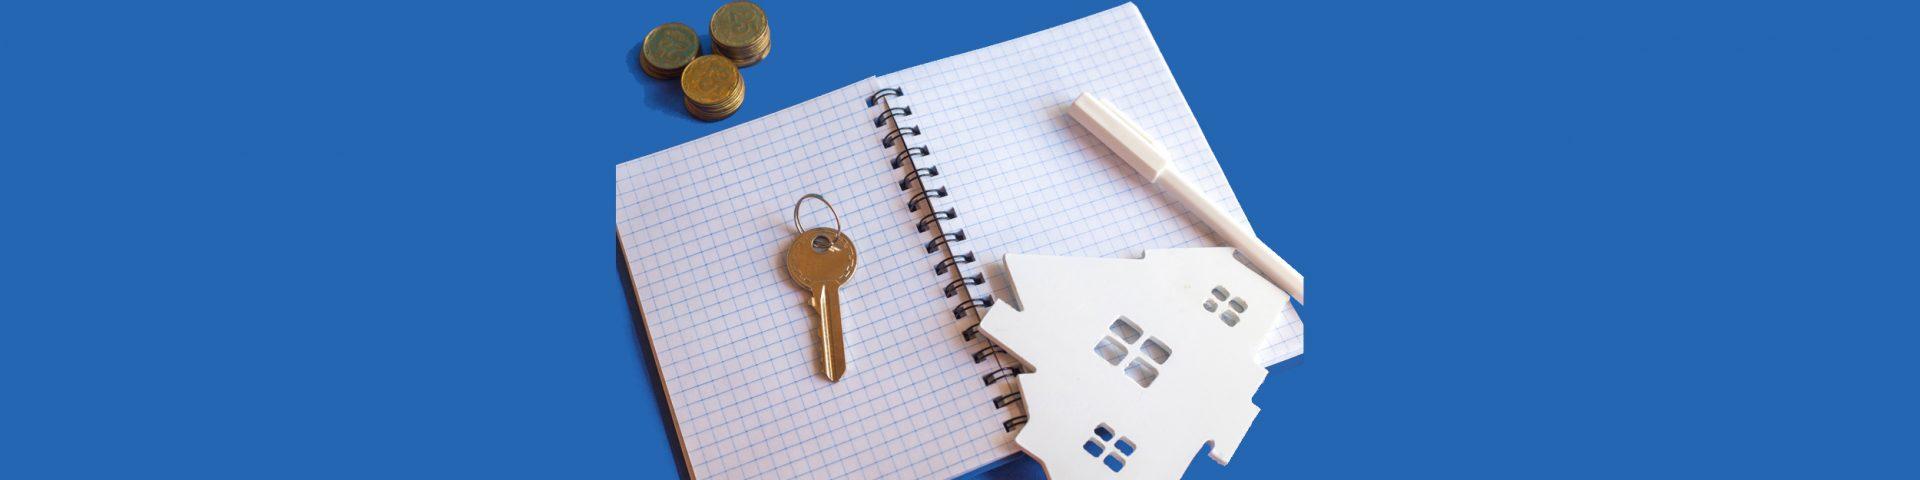 MK Property Shop - We Buy Houses